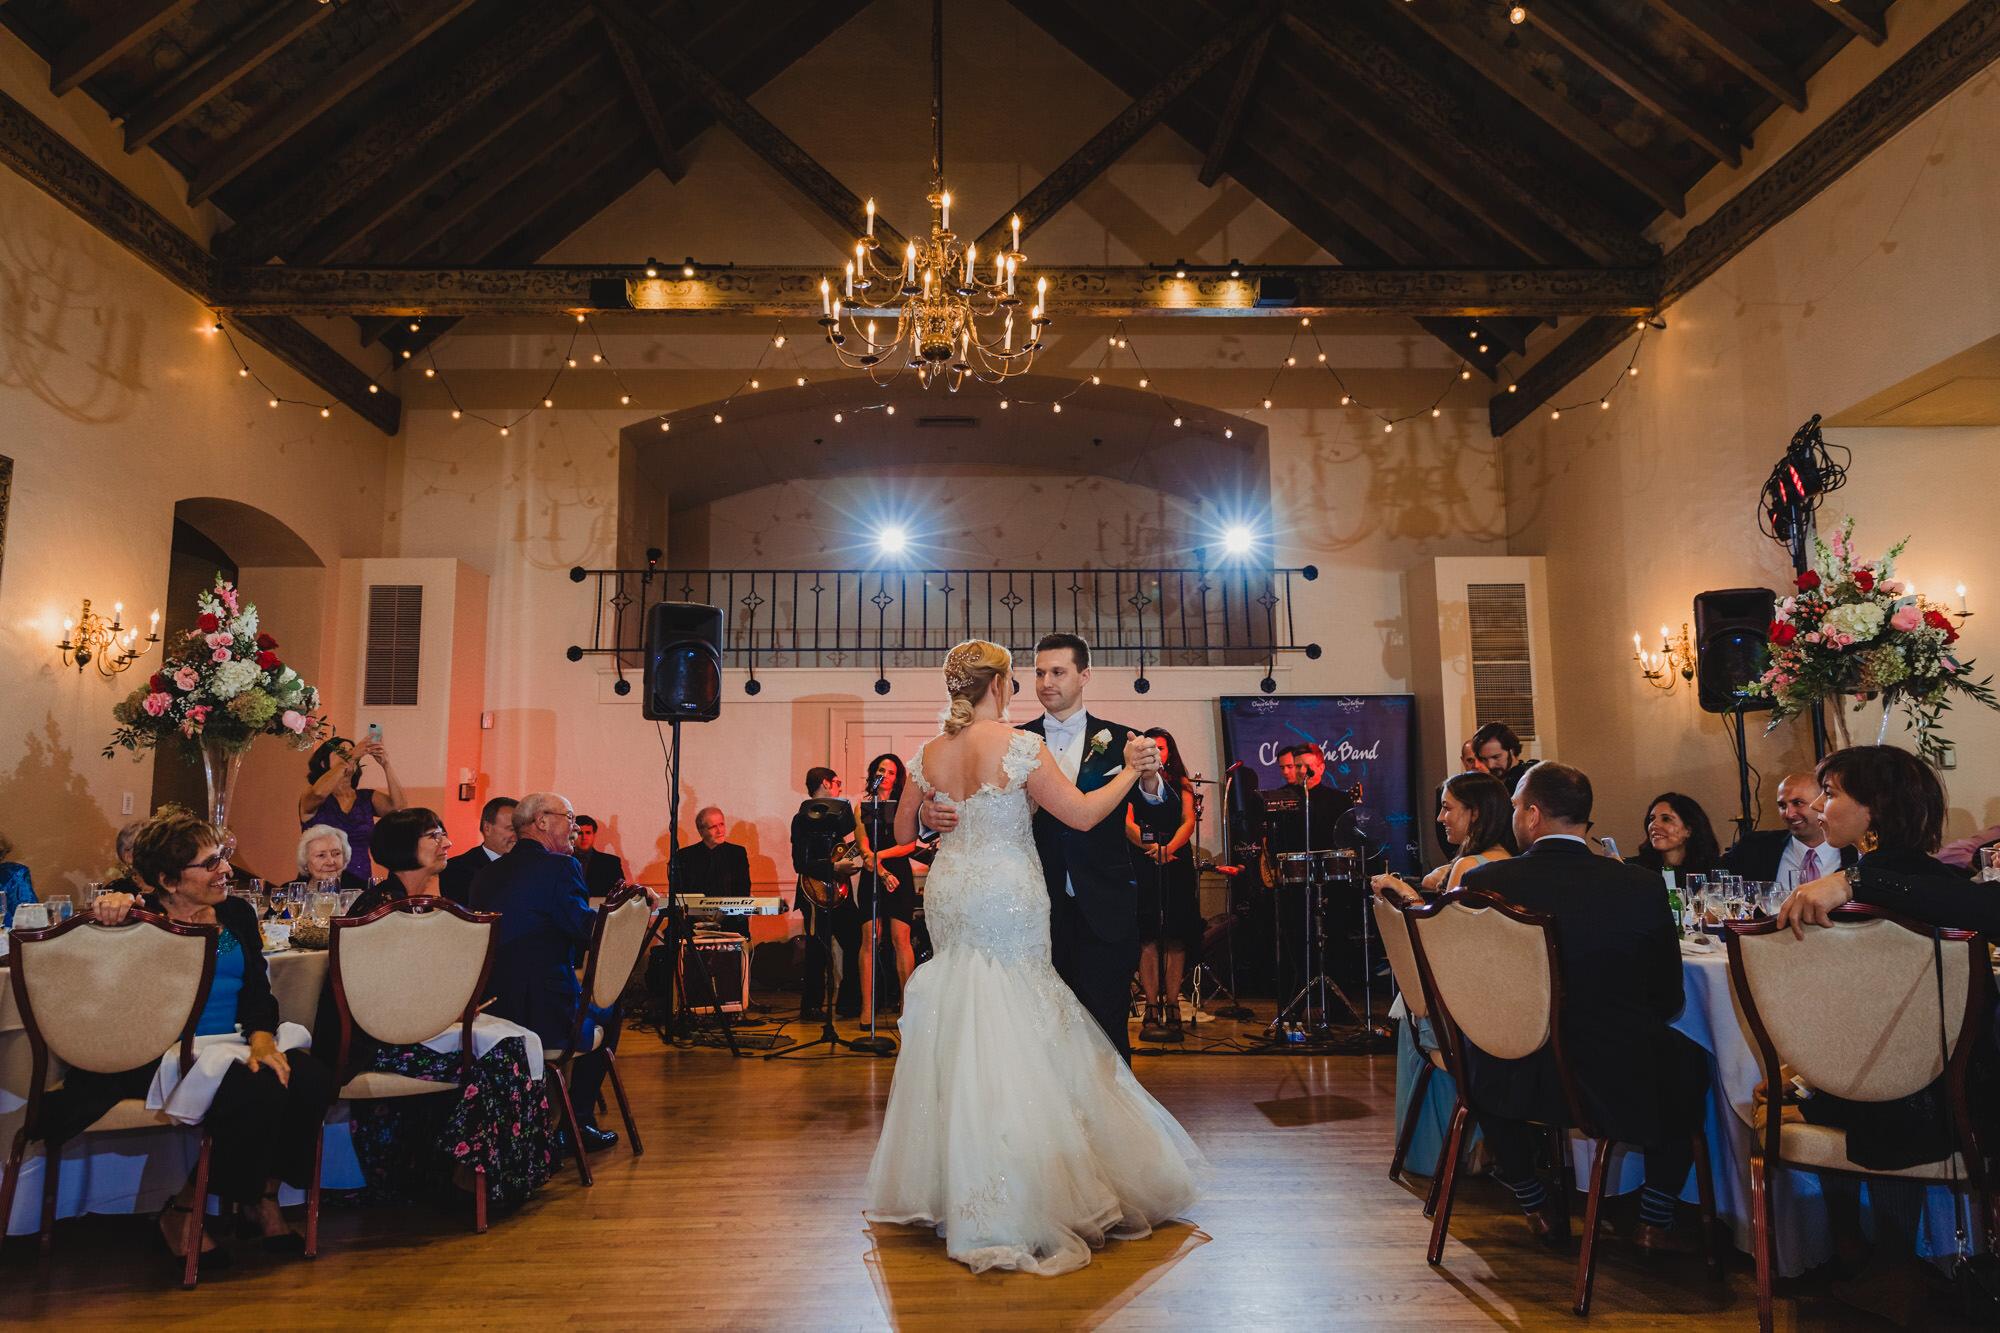 Christina & Dan Wedding at Huntingdon Valley Country Club 00018.JPG